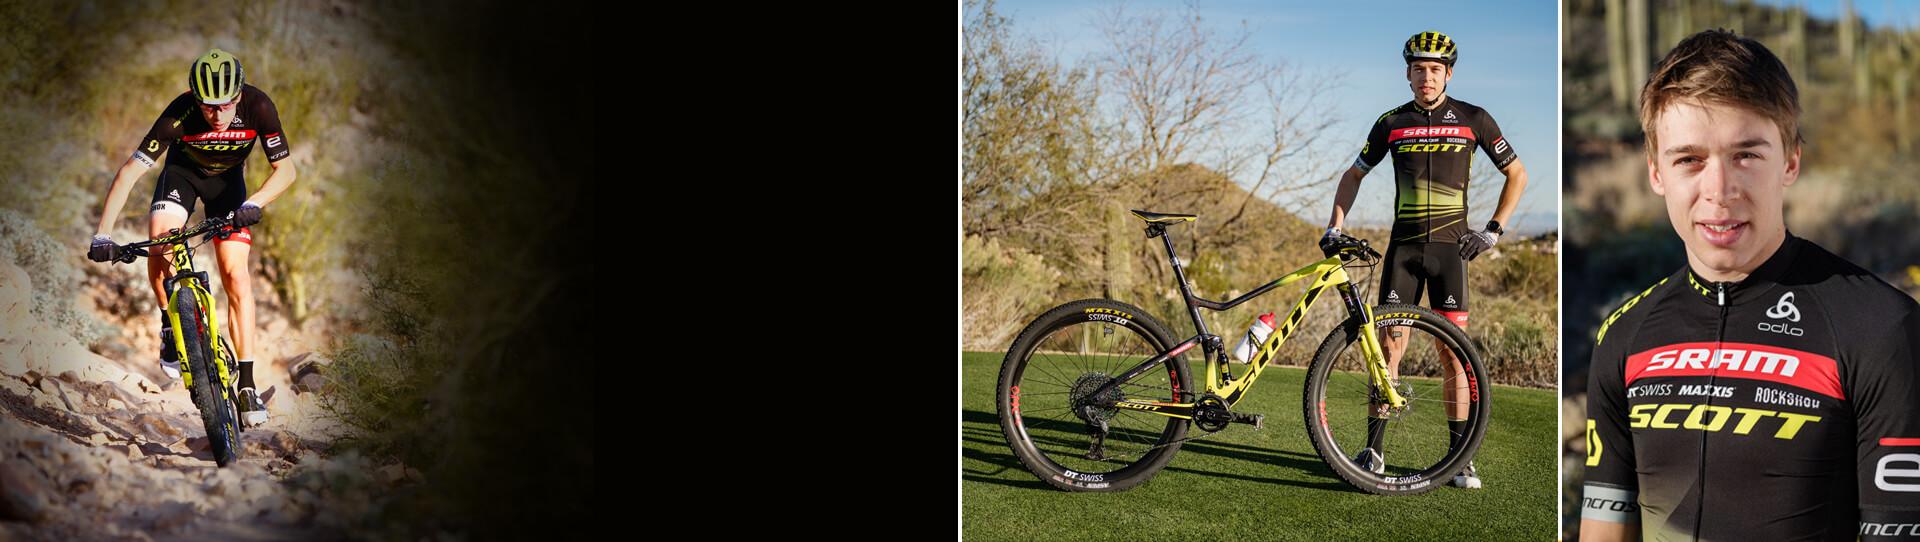 ODLO Cycling & Mountainbiking in Summer Sports Underwear and Perormance